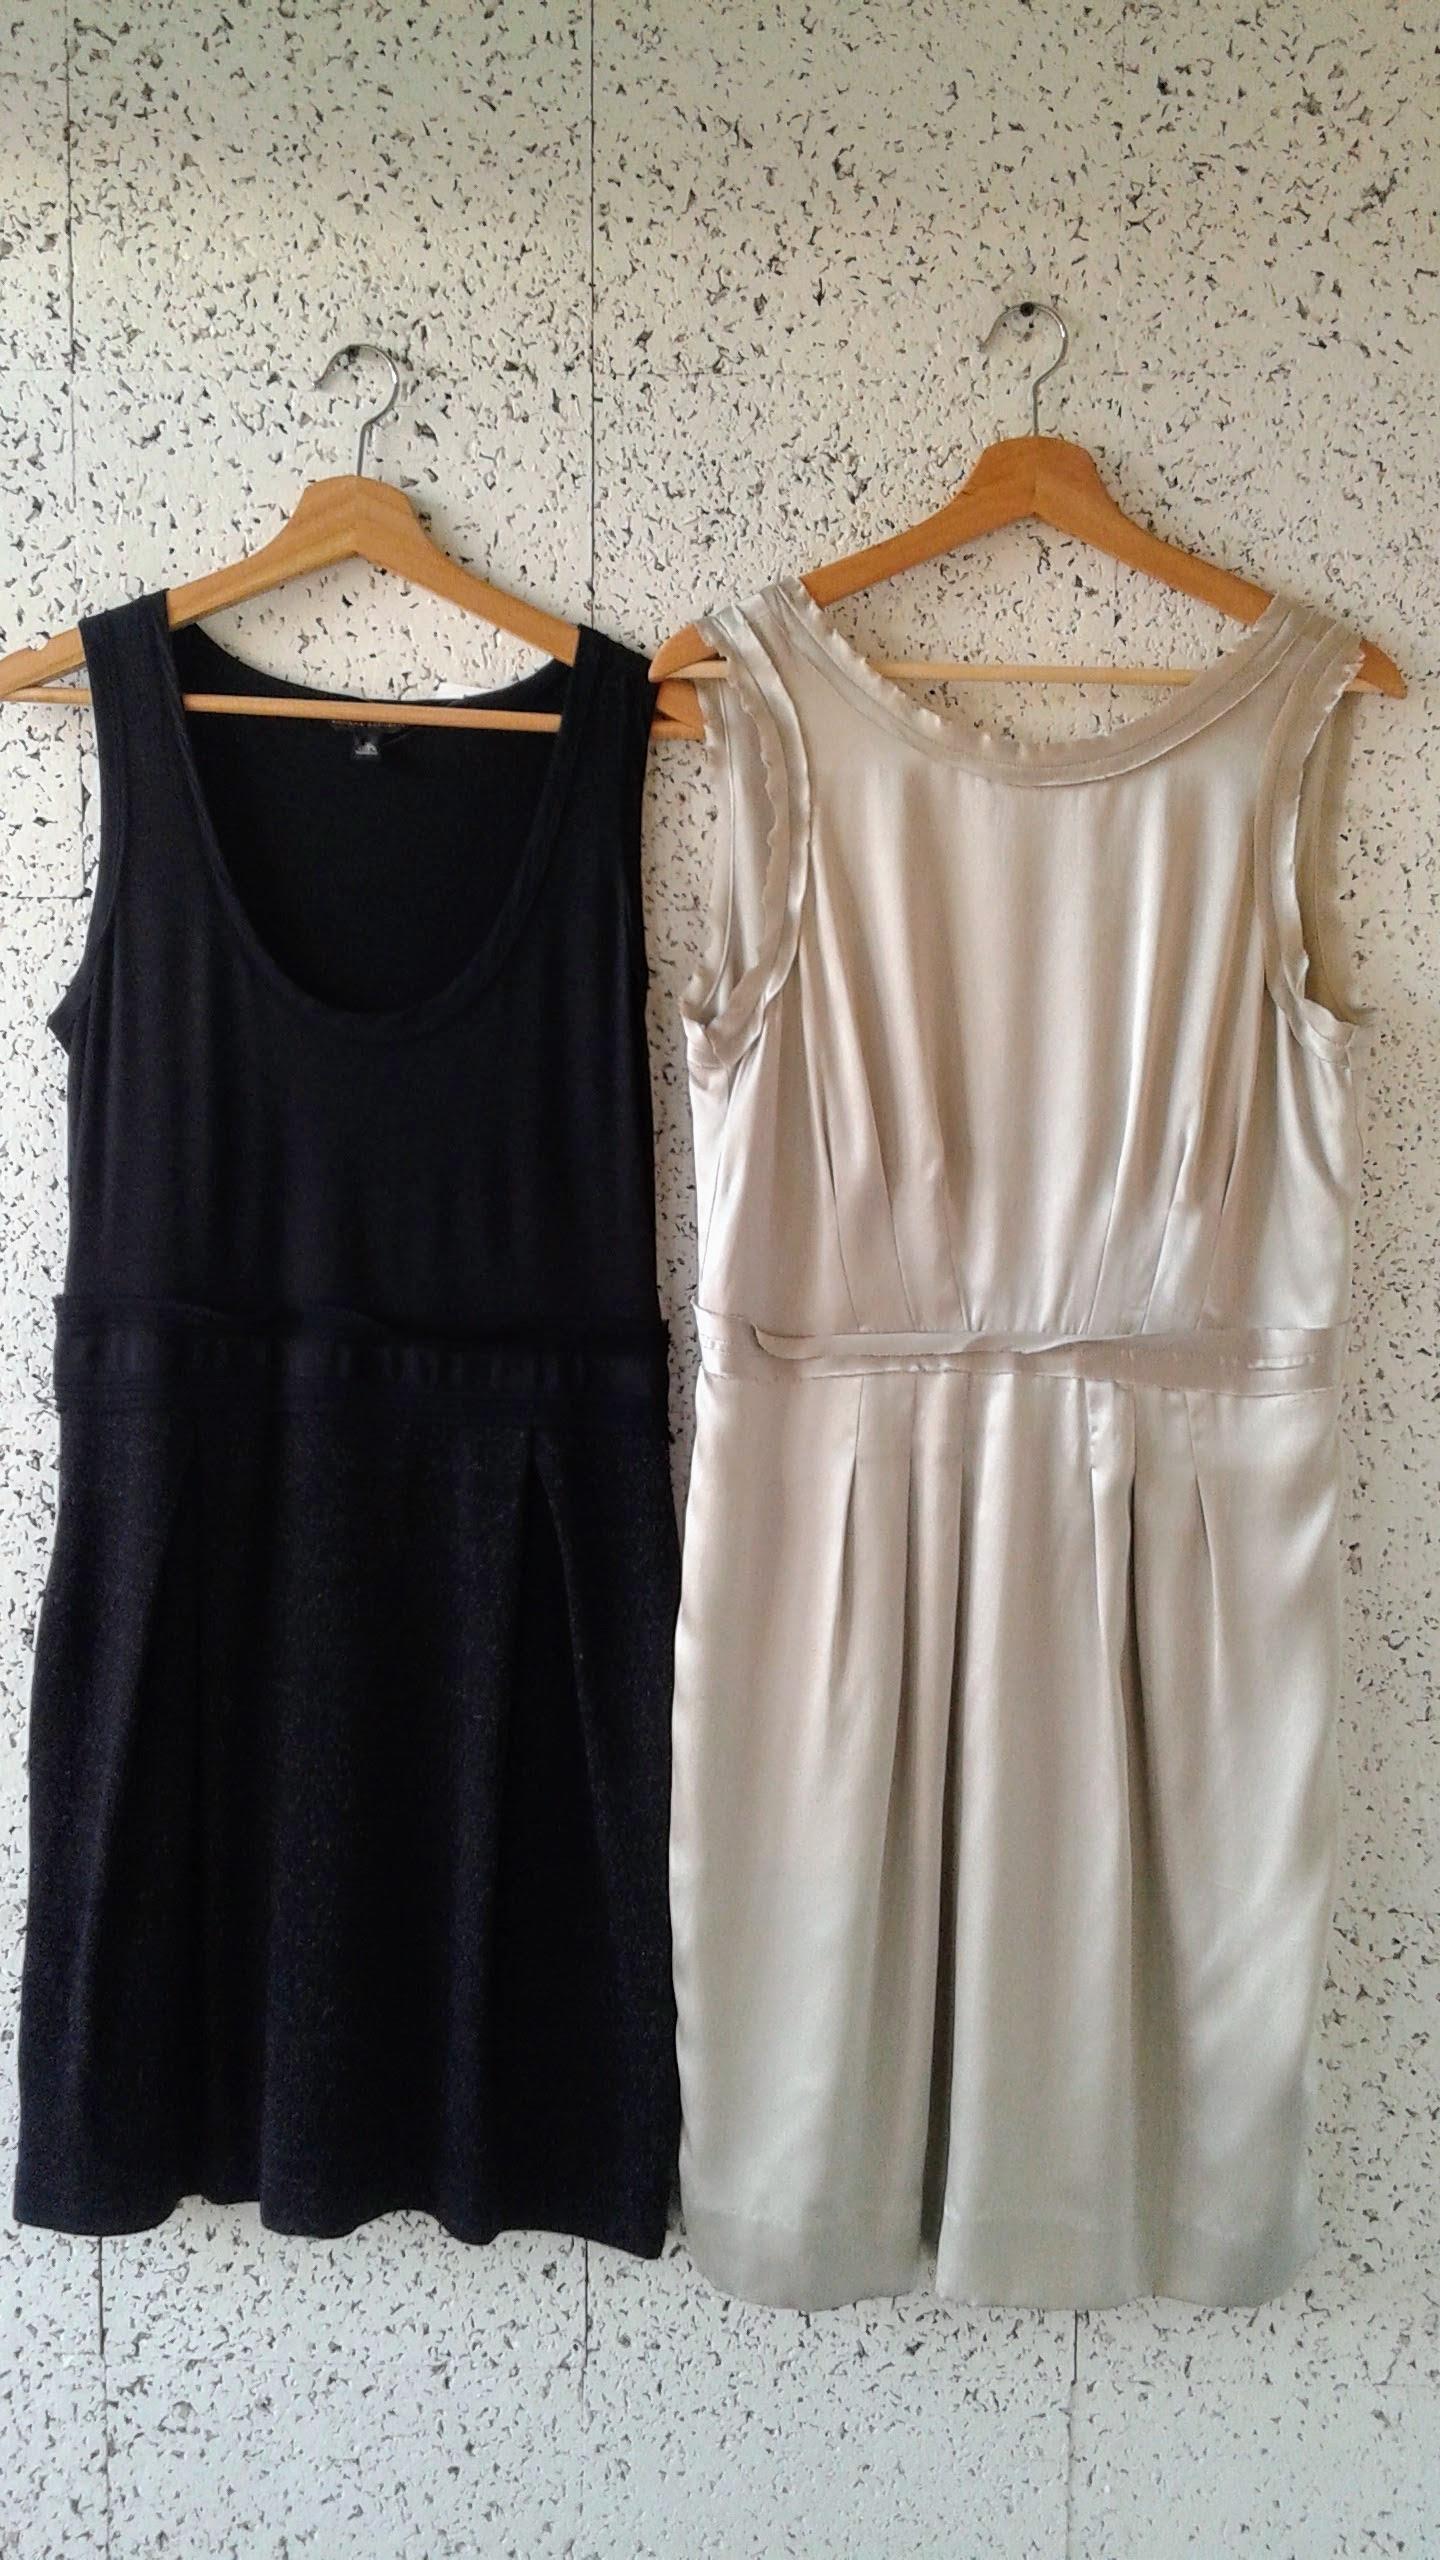 Banana Republic dresses, each (NWT); Size 10, $48.